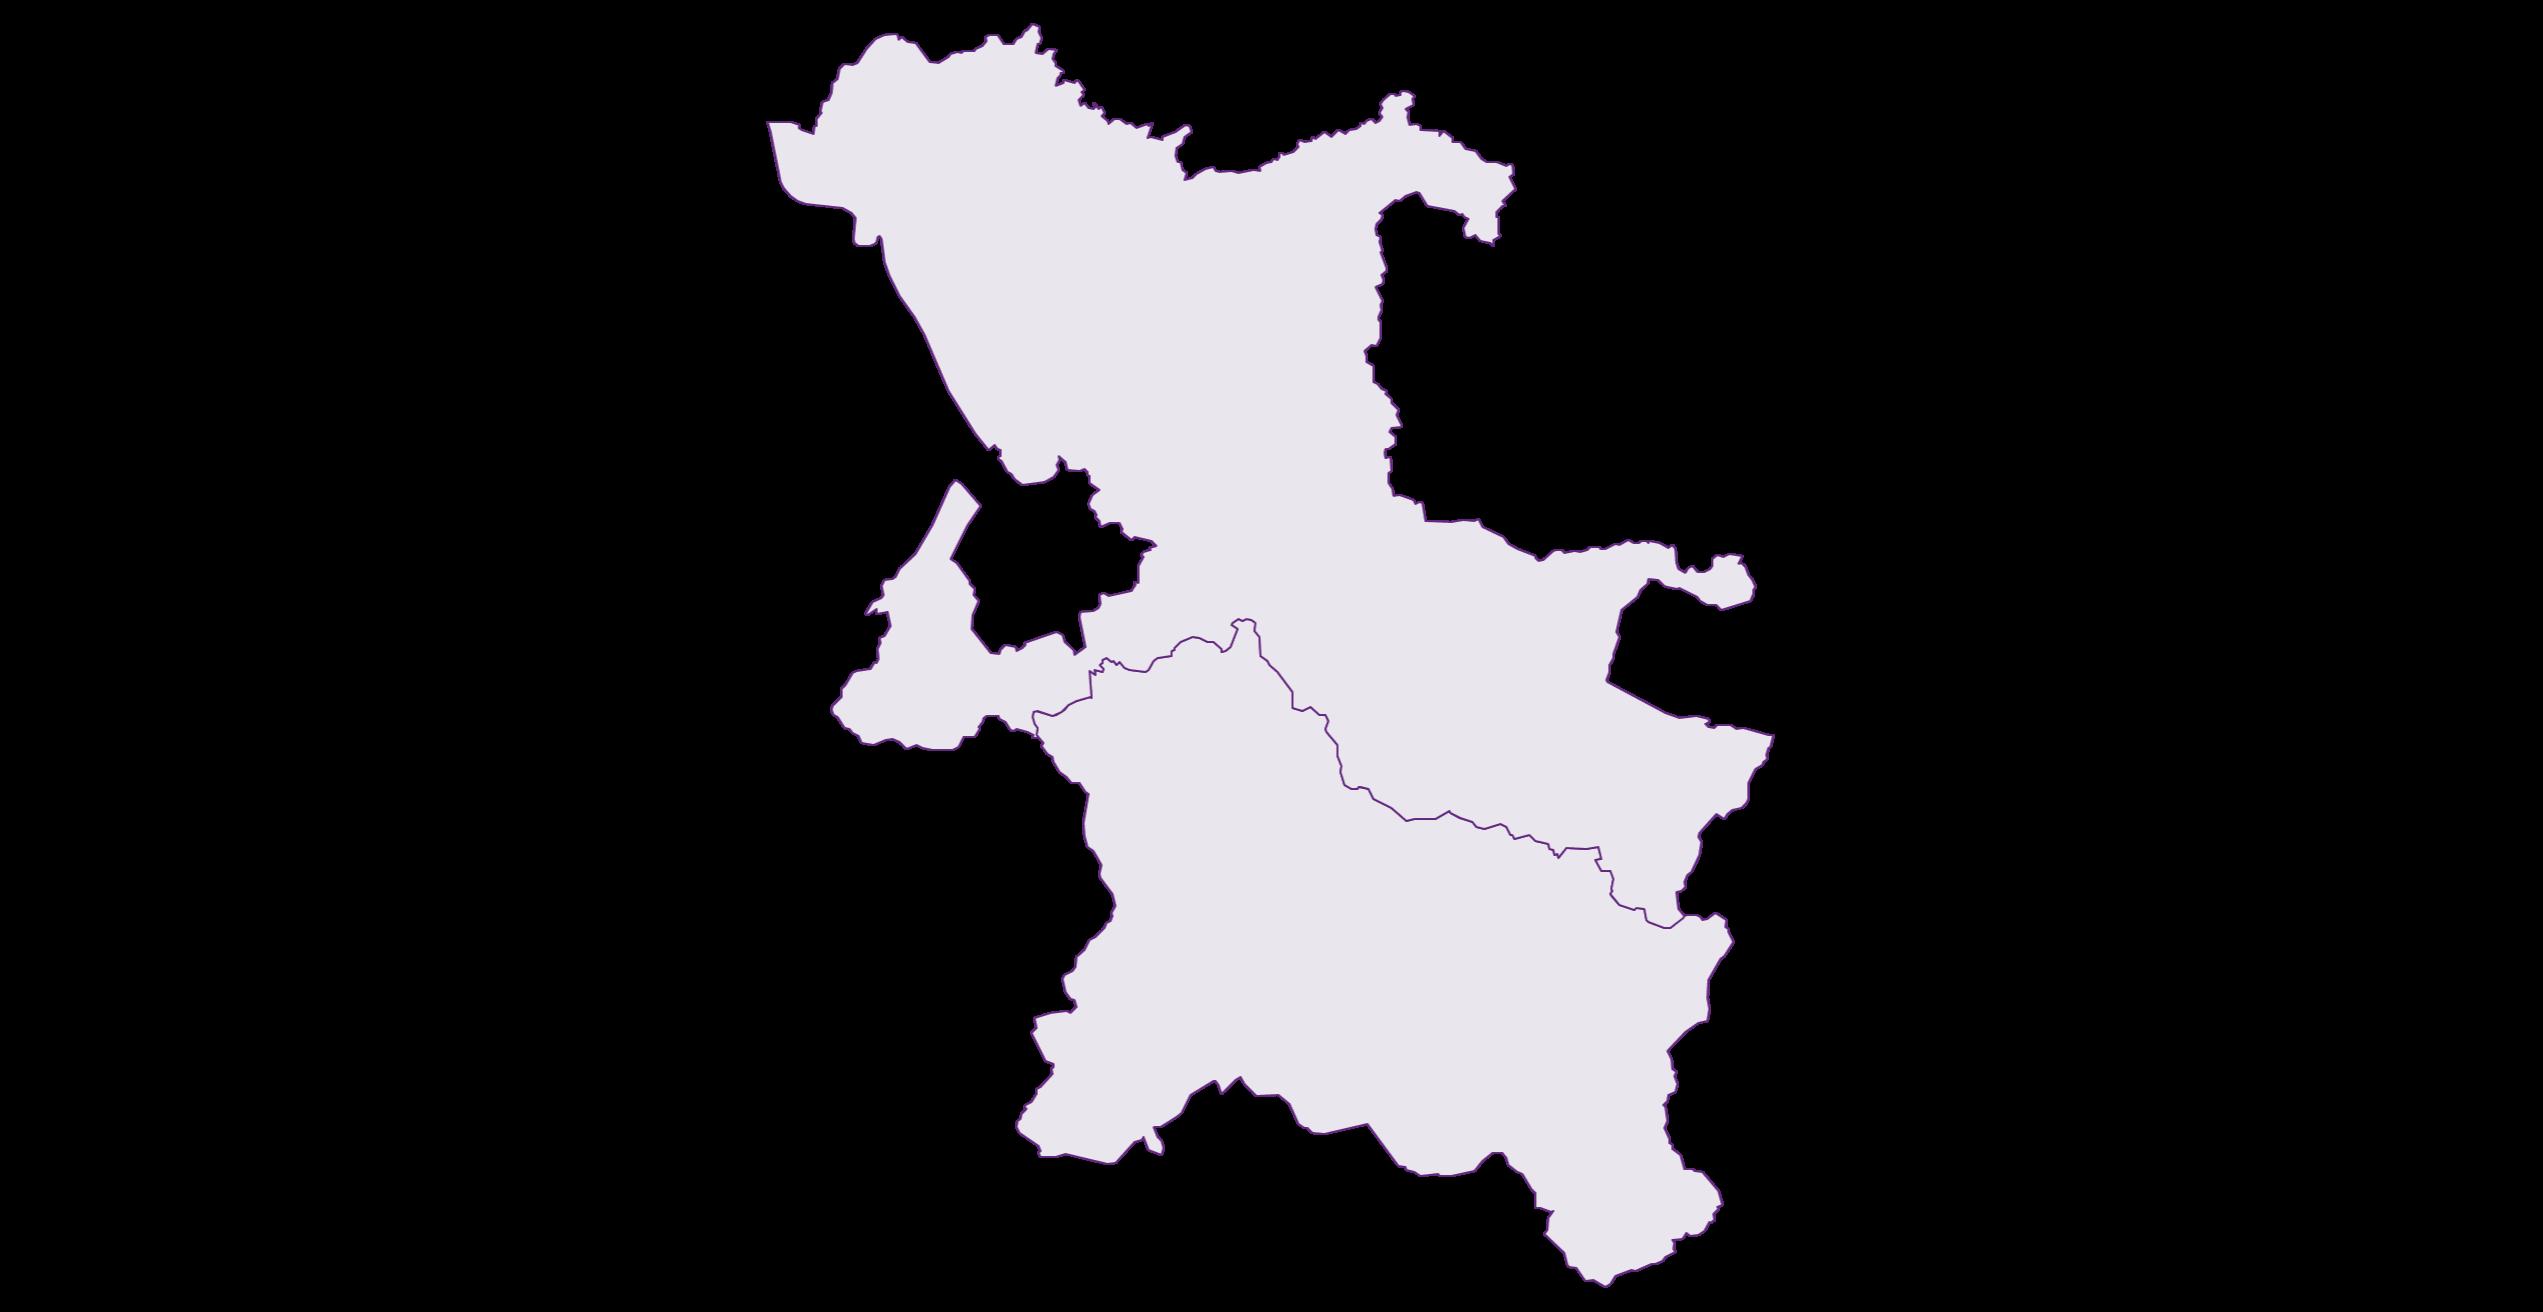 Flachgau/Tennengau - Region - Austria - Geography, business and economics, statistics | Similio